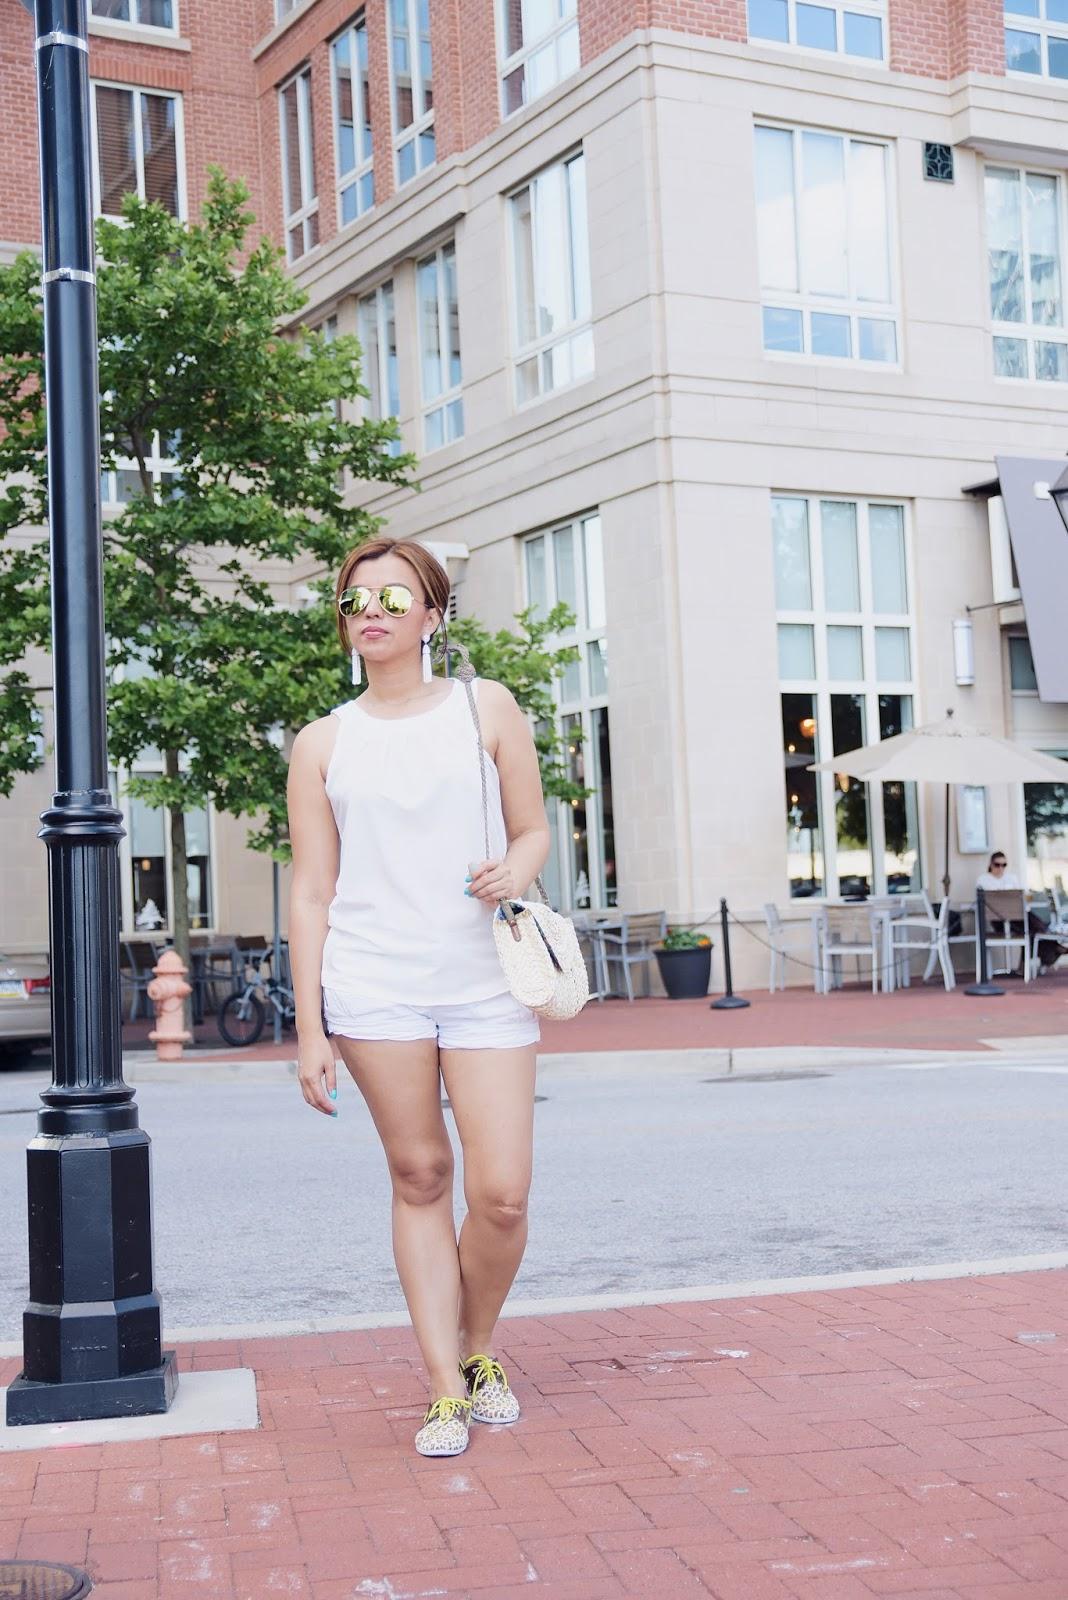 Wearing: Marisol Tshirt: LightInTheBox Shorts: TJMax Shoes: Chatties  Mau Pants: H&M Shirt: LightInTheBox Bracelet: LigthInTheBox